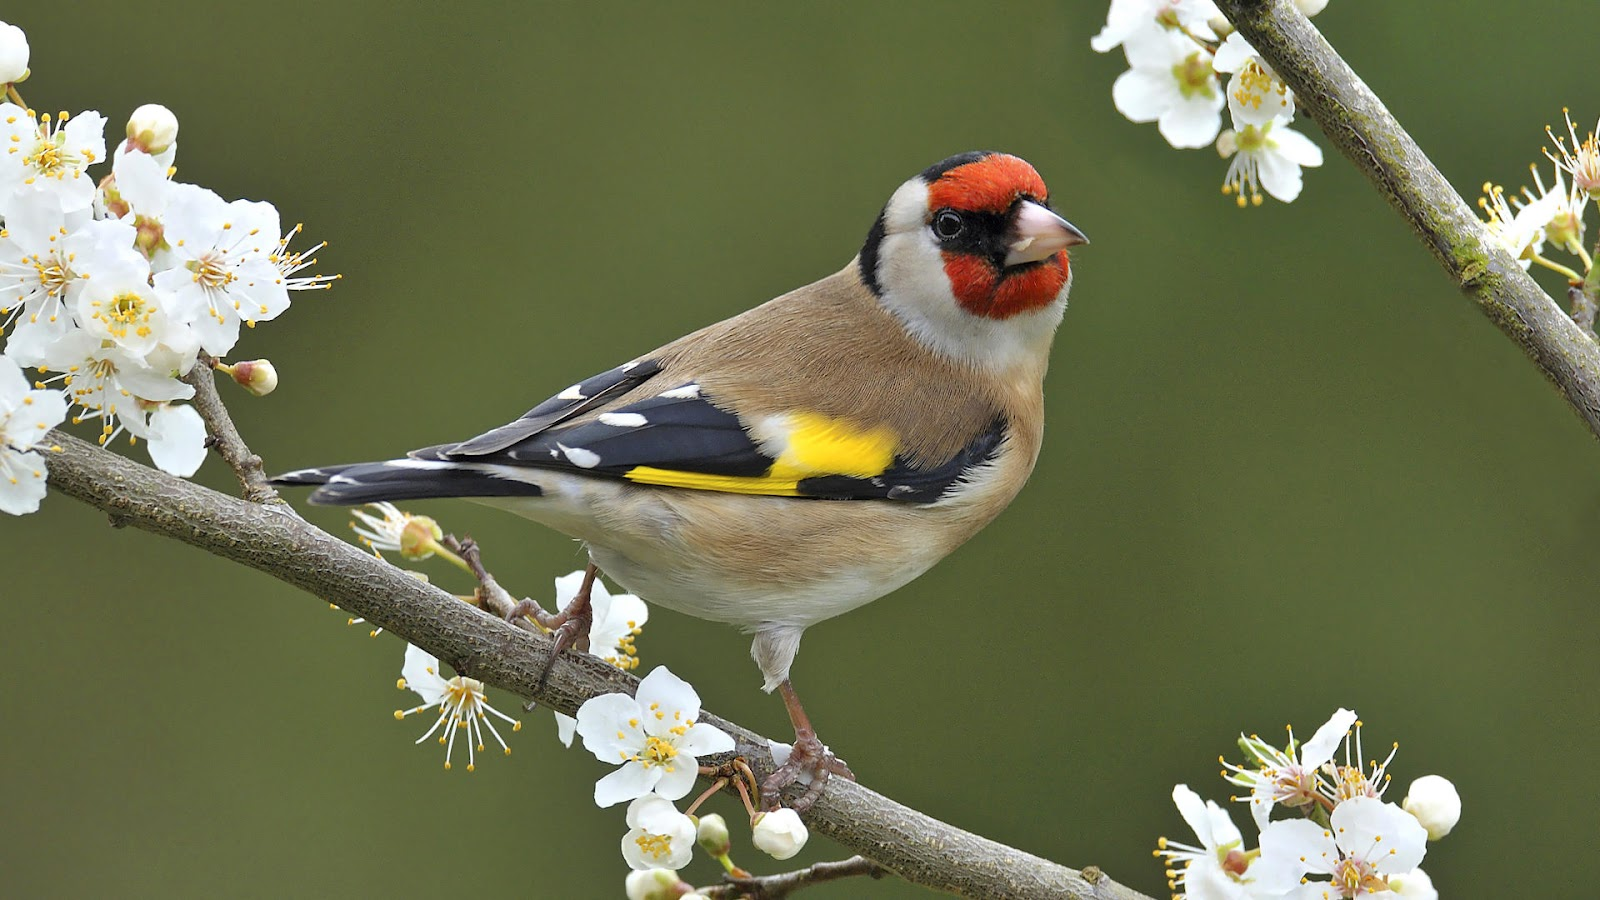 bird sitting on a branch wallpaper hd animals wallpapers